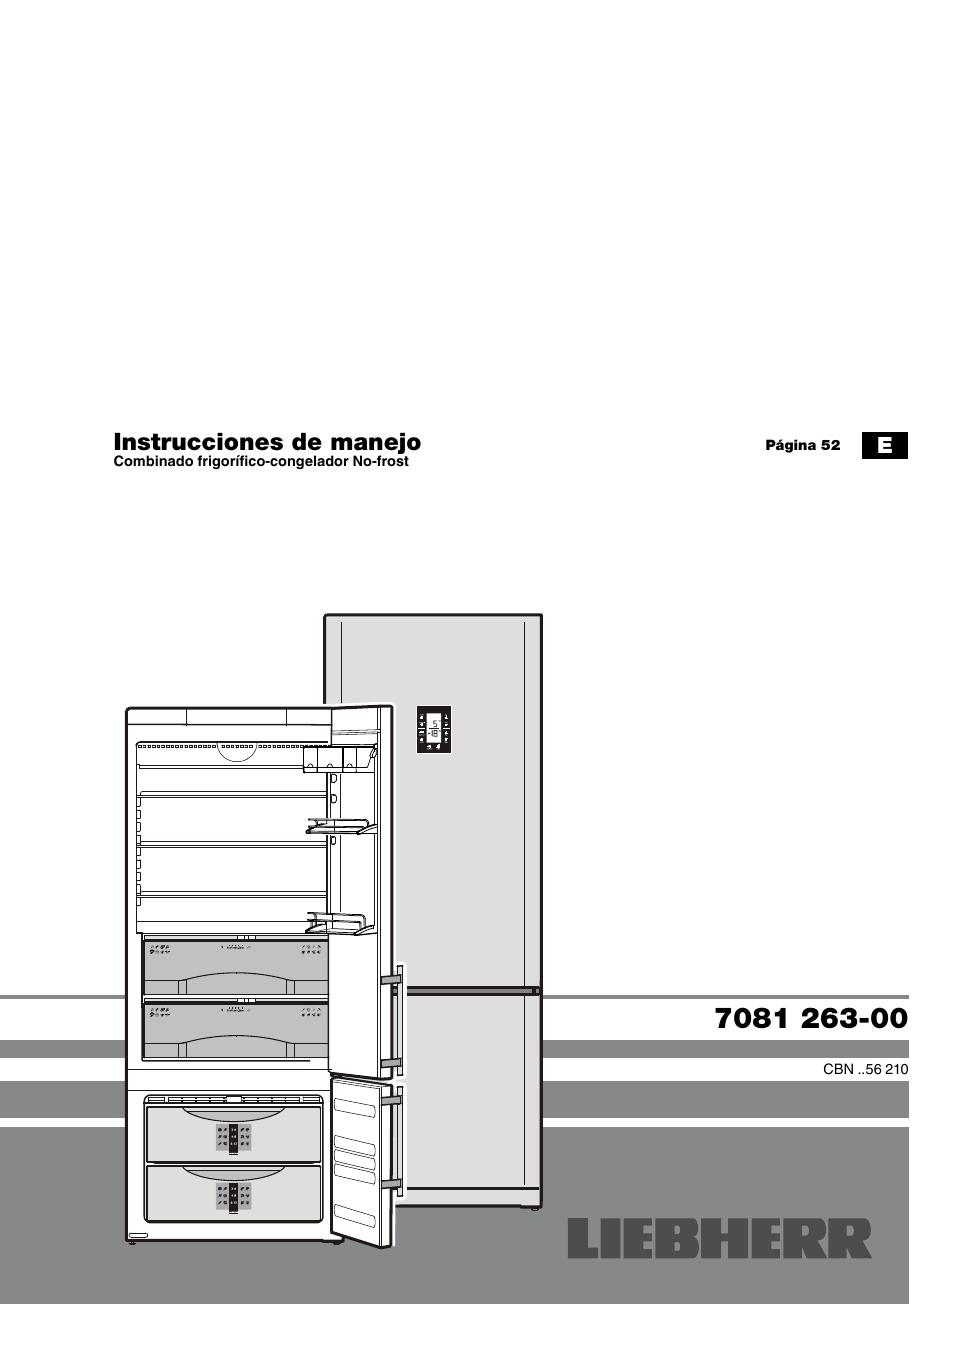 Liebherr CBNes 4656 Premium BioFresh NoFrost Manual del usuario | Páginas:  11 | También para: CBNes 5156 Premium BioFresh NoFrost